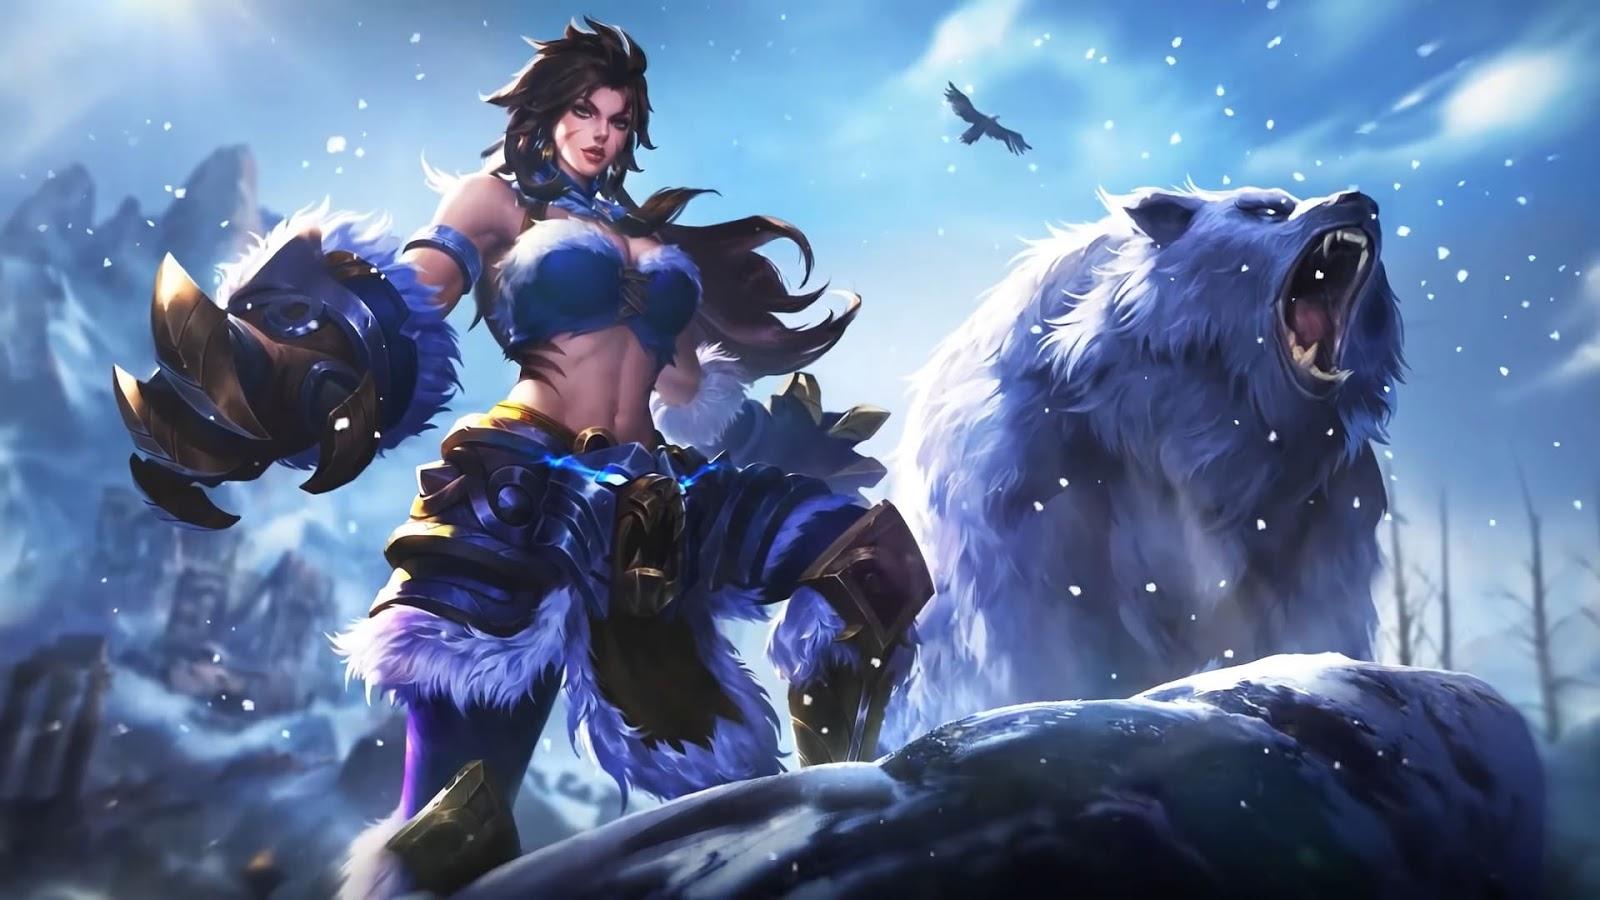 Wallpaper Masha Winter Guard Skin Mobile Legends HD for PC